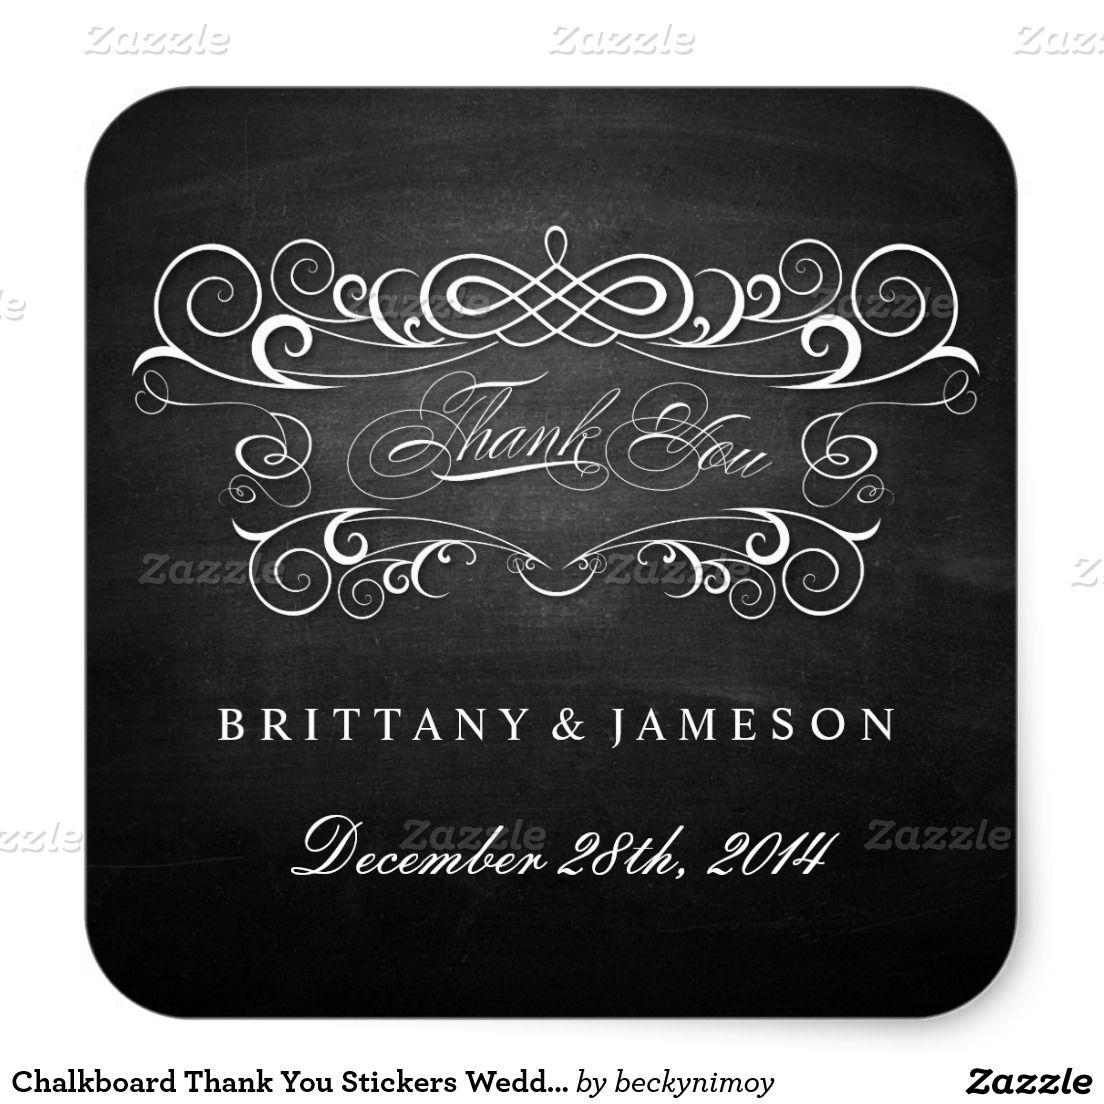 monogram wedding envelope seals sticker%0A Chalkboard Thank You Stickers Wedding Favors